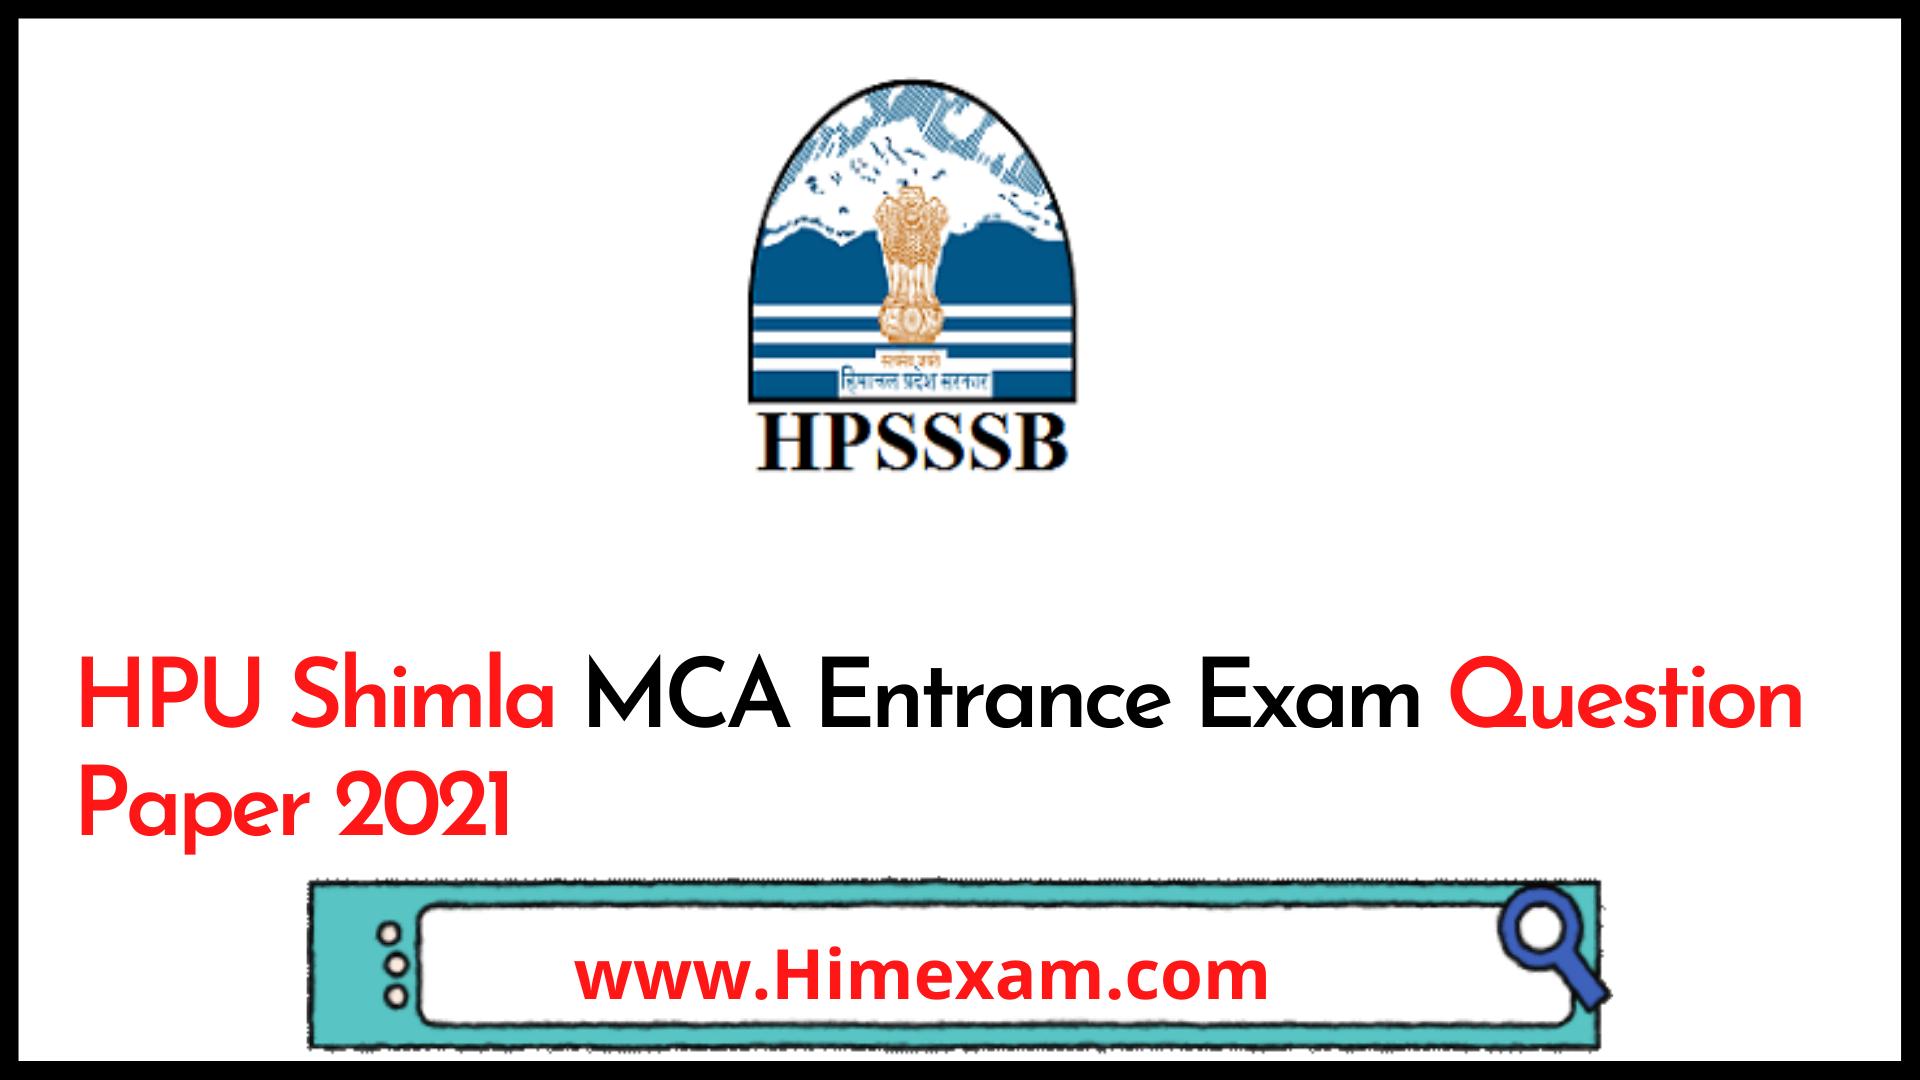 HPU Shimla MCA Entrance Exam Question Paper 2021